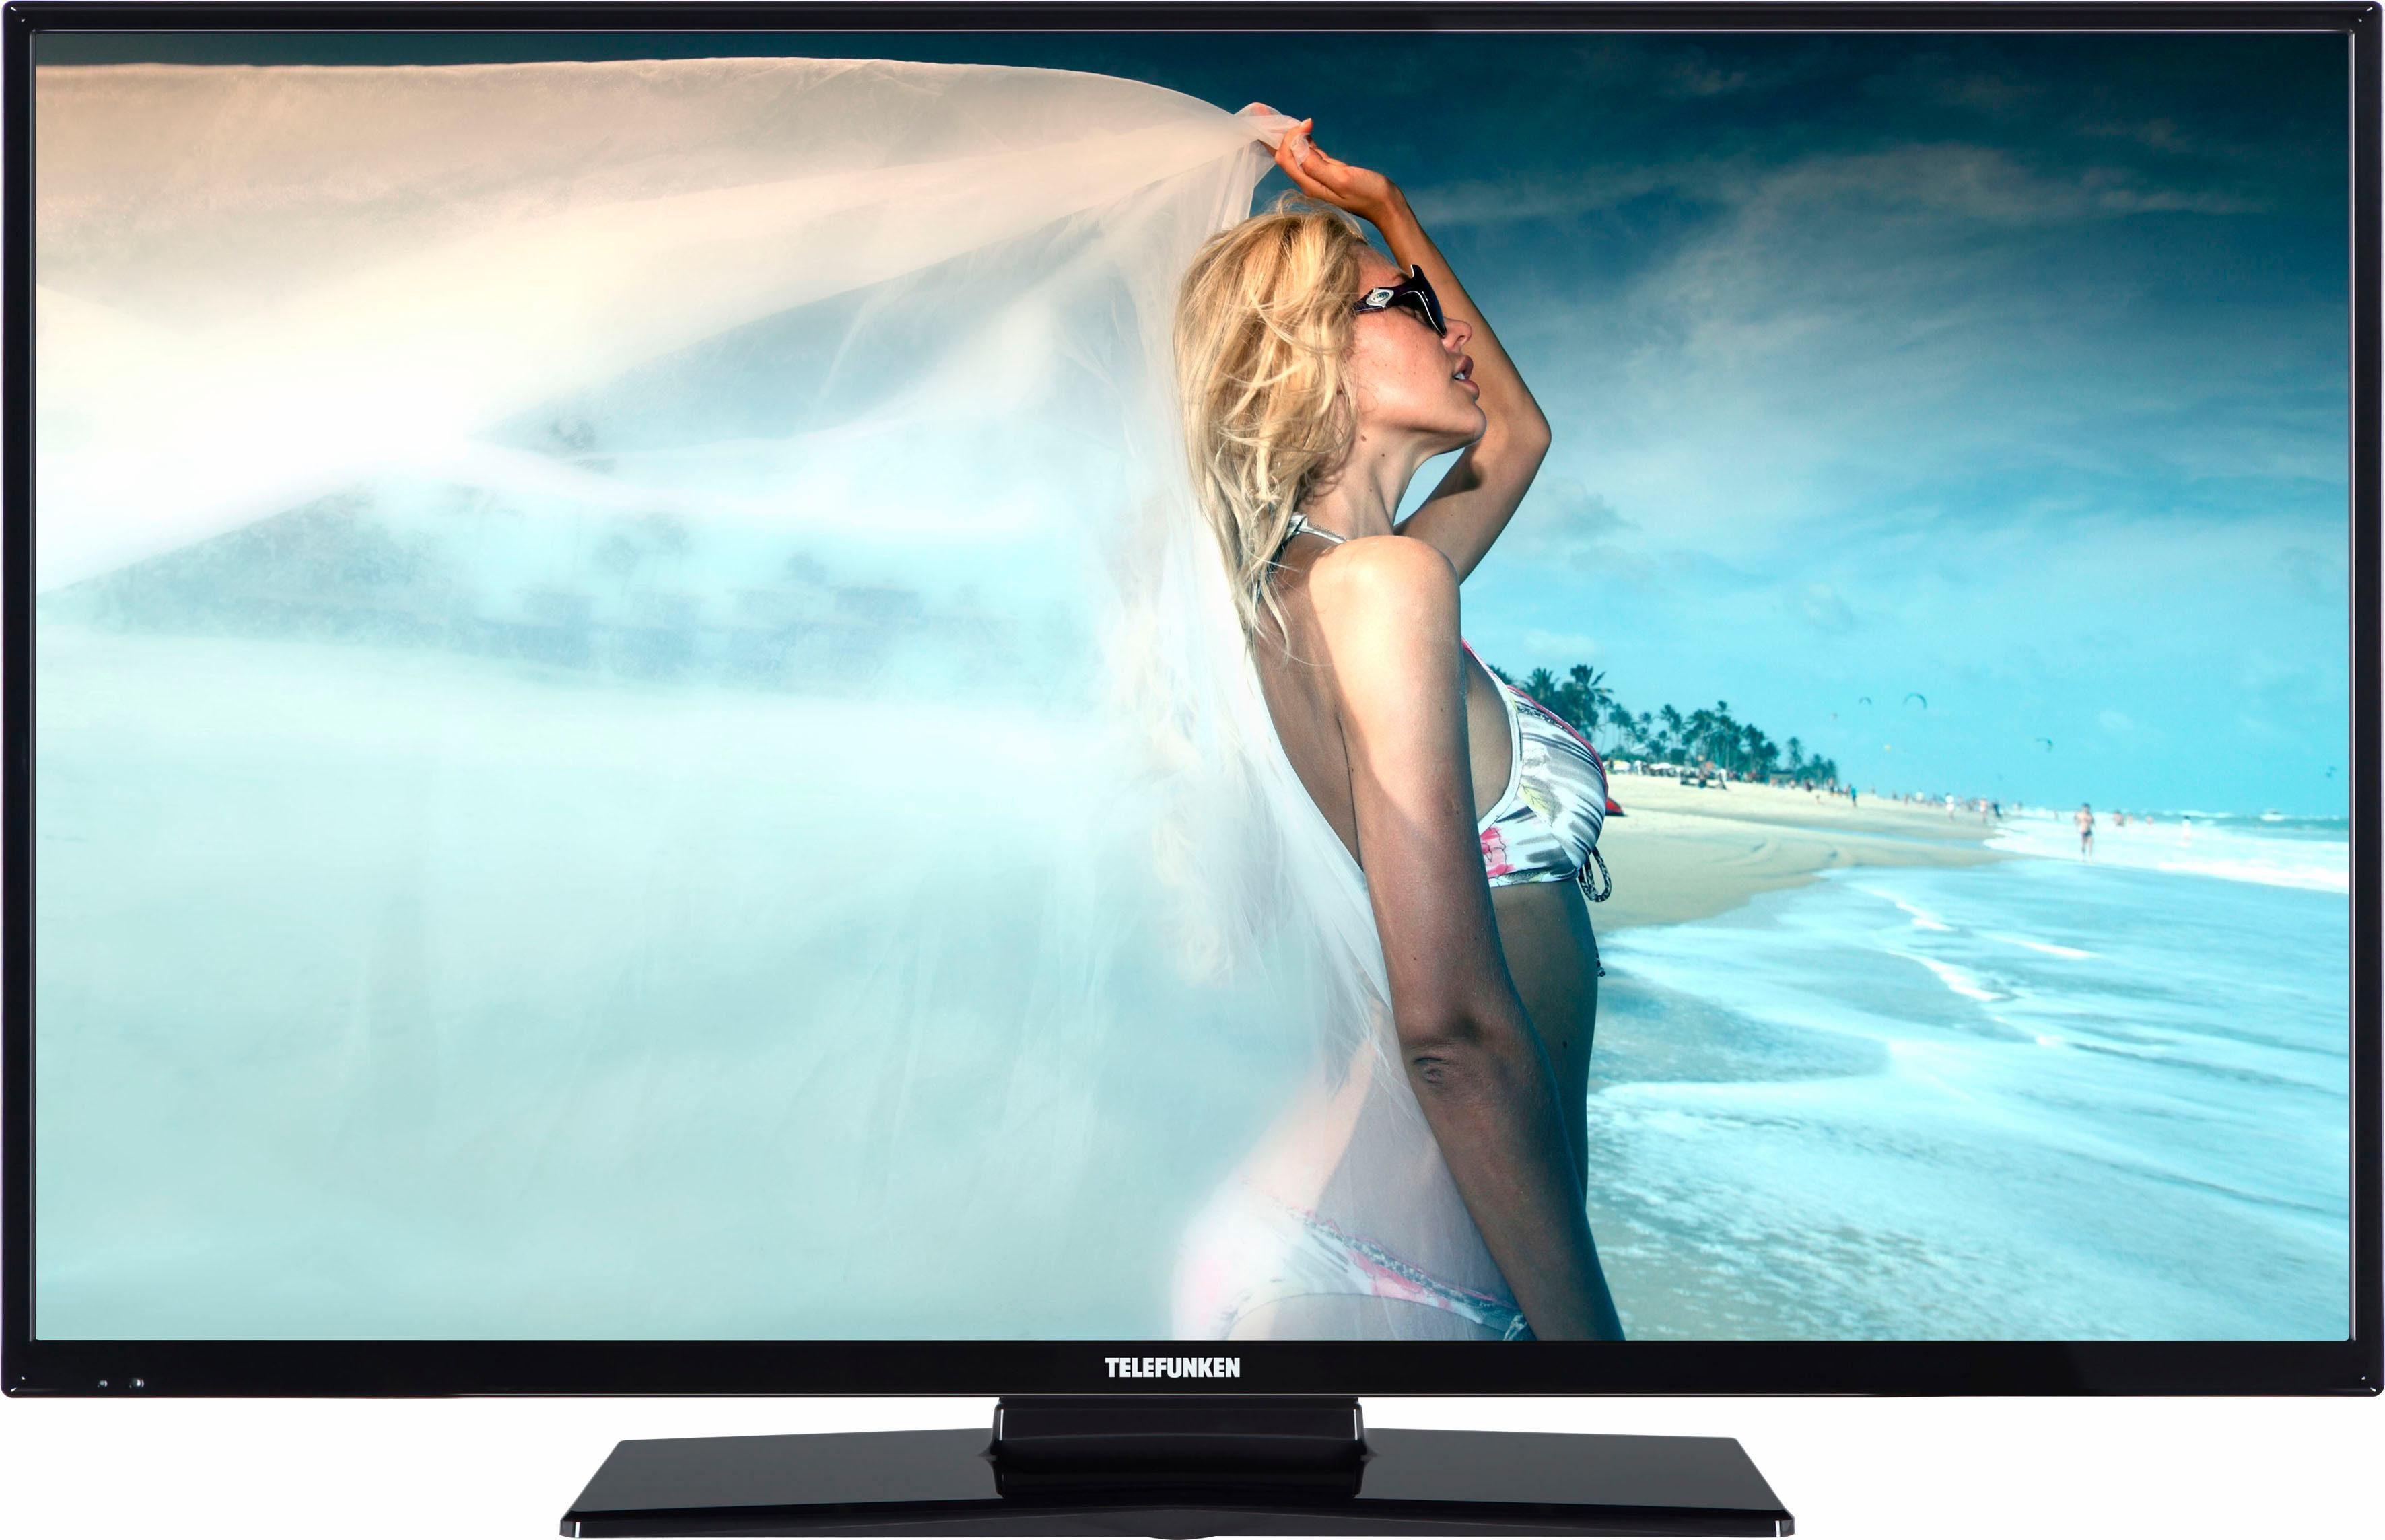 Telefunken D43F287M4CW, LED Fernseher, 110 cm (43 Zoll), 1080p (Full HD), Smart-TV